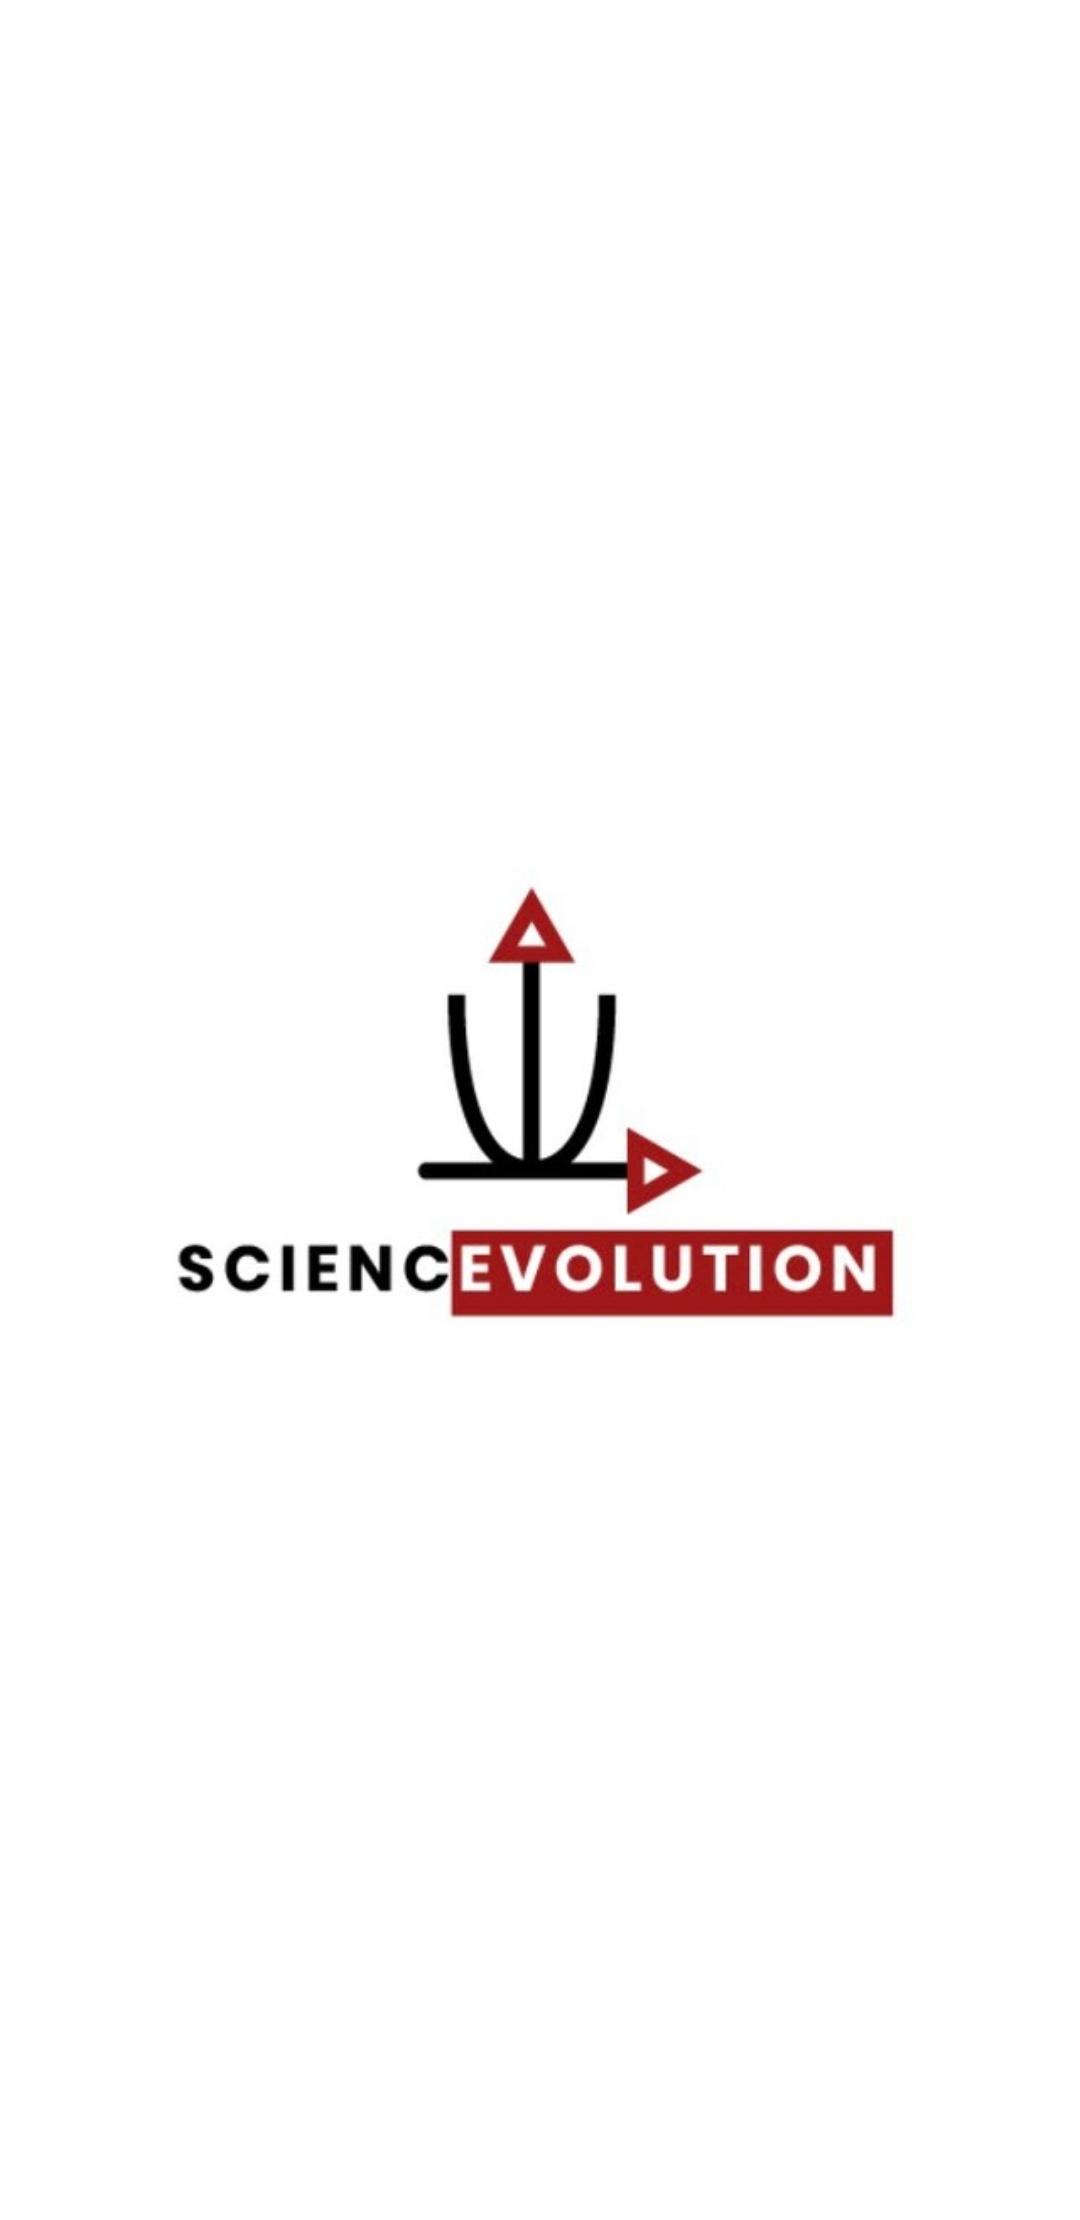 sciencevolution